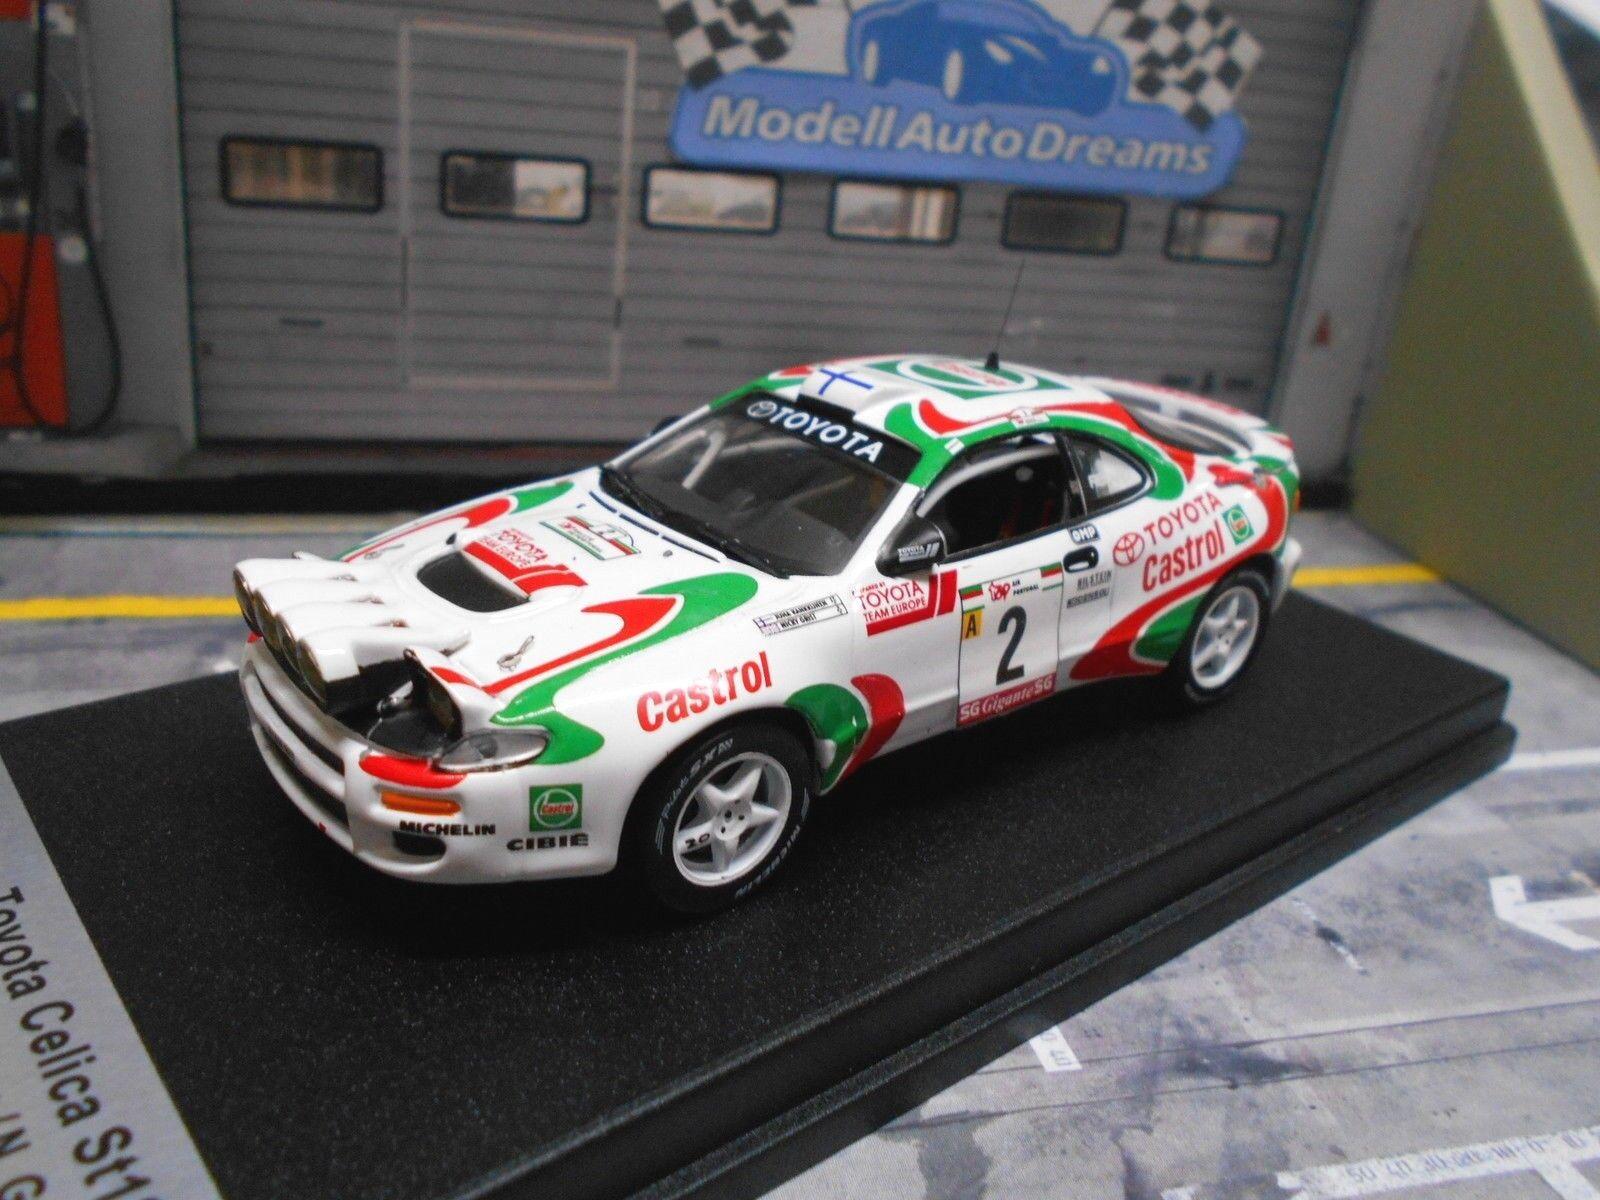 TOYOTA CELICA 4x4 st185 Rallye Portugal 1994  Kankkunen Winner TROFEU 1 150 1 43  grande vente